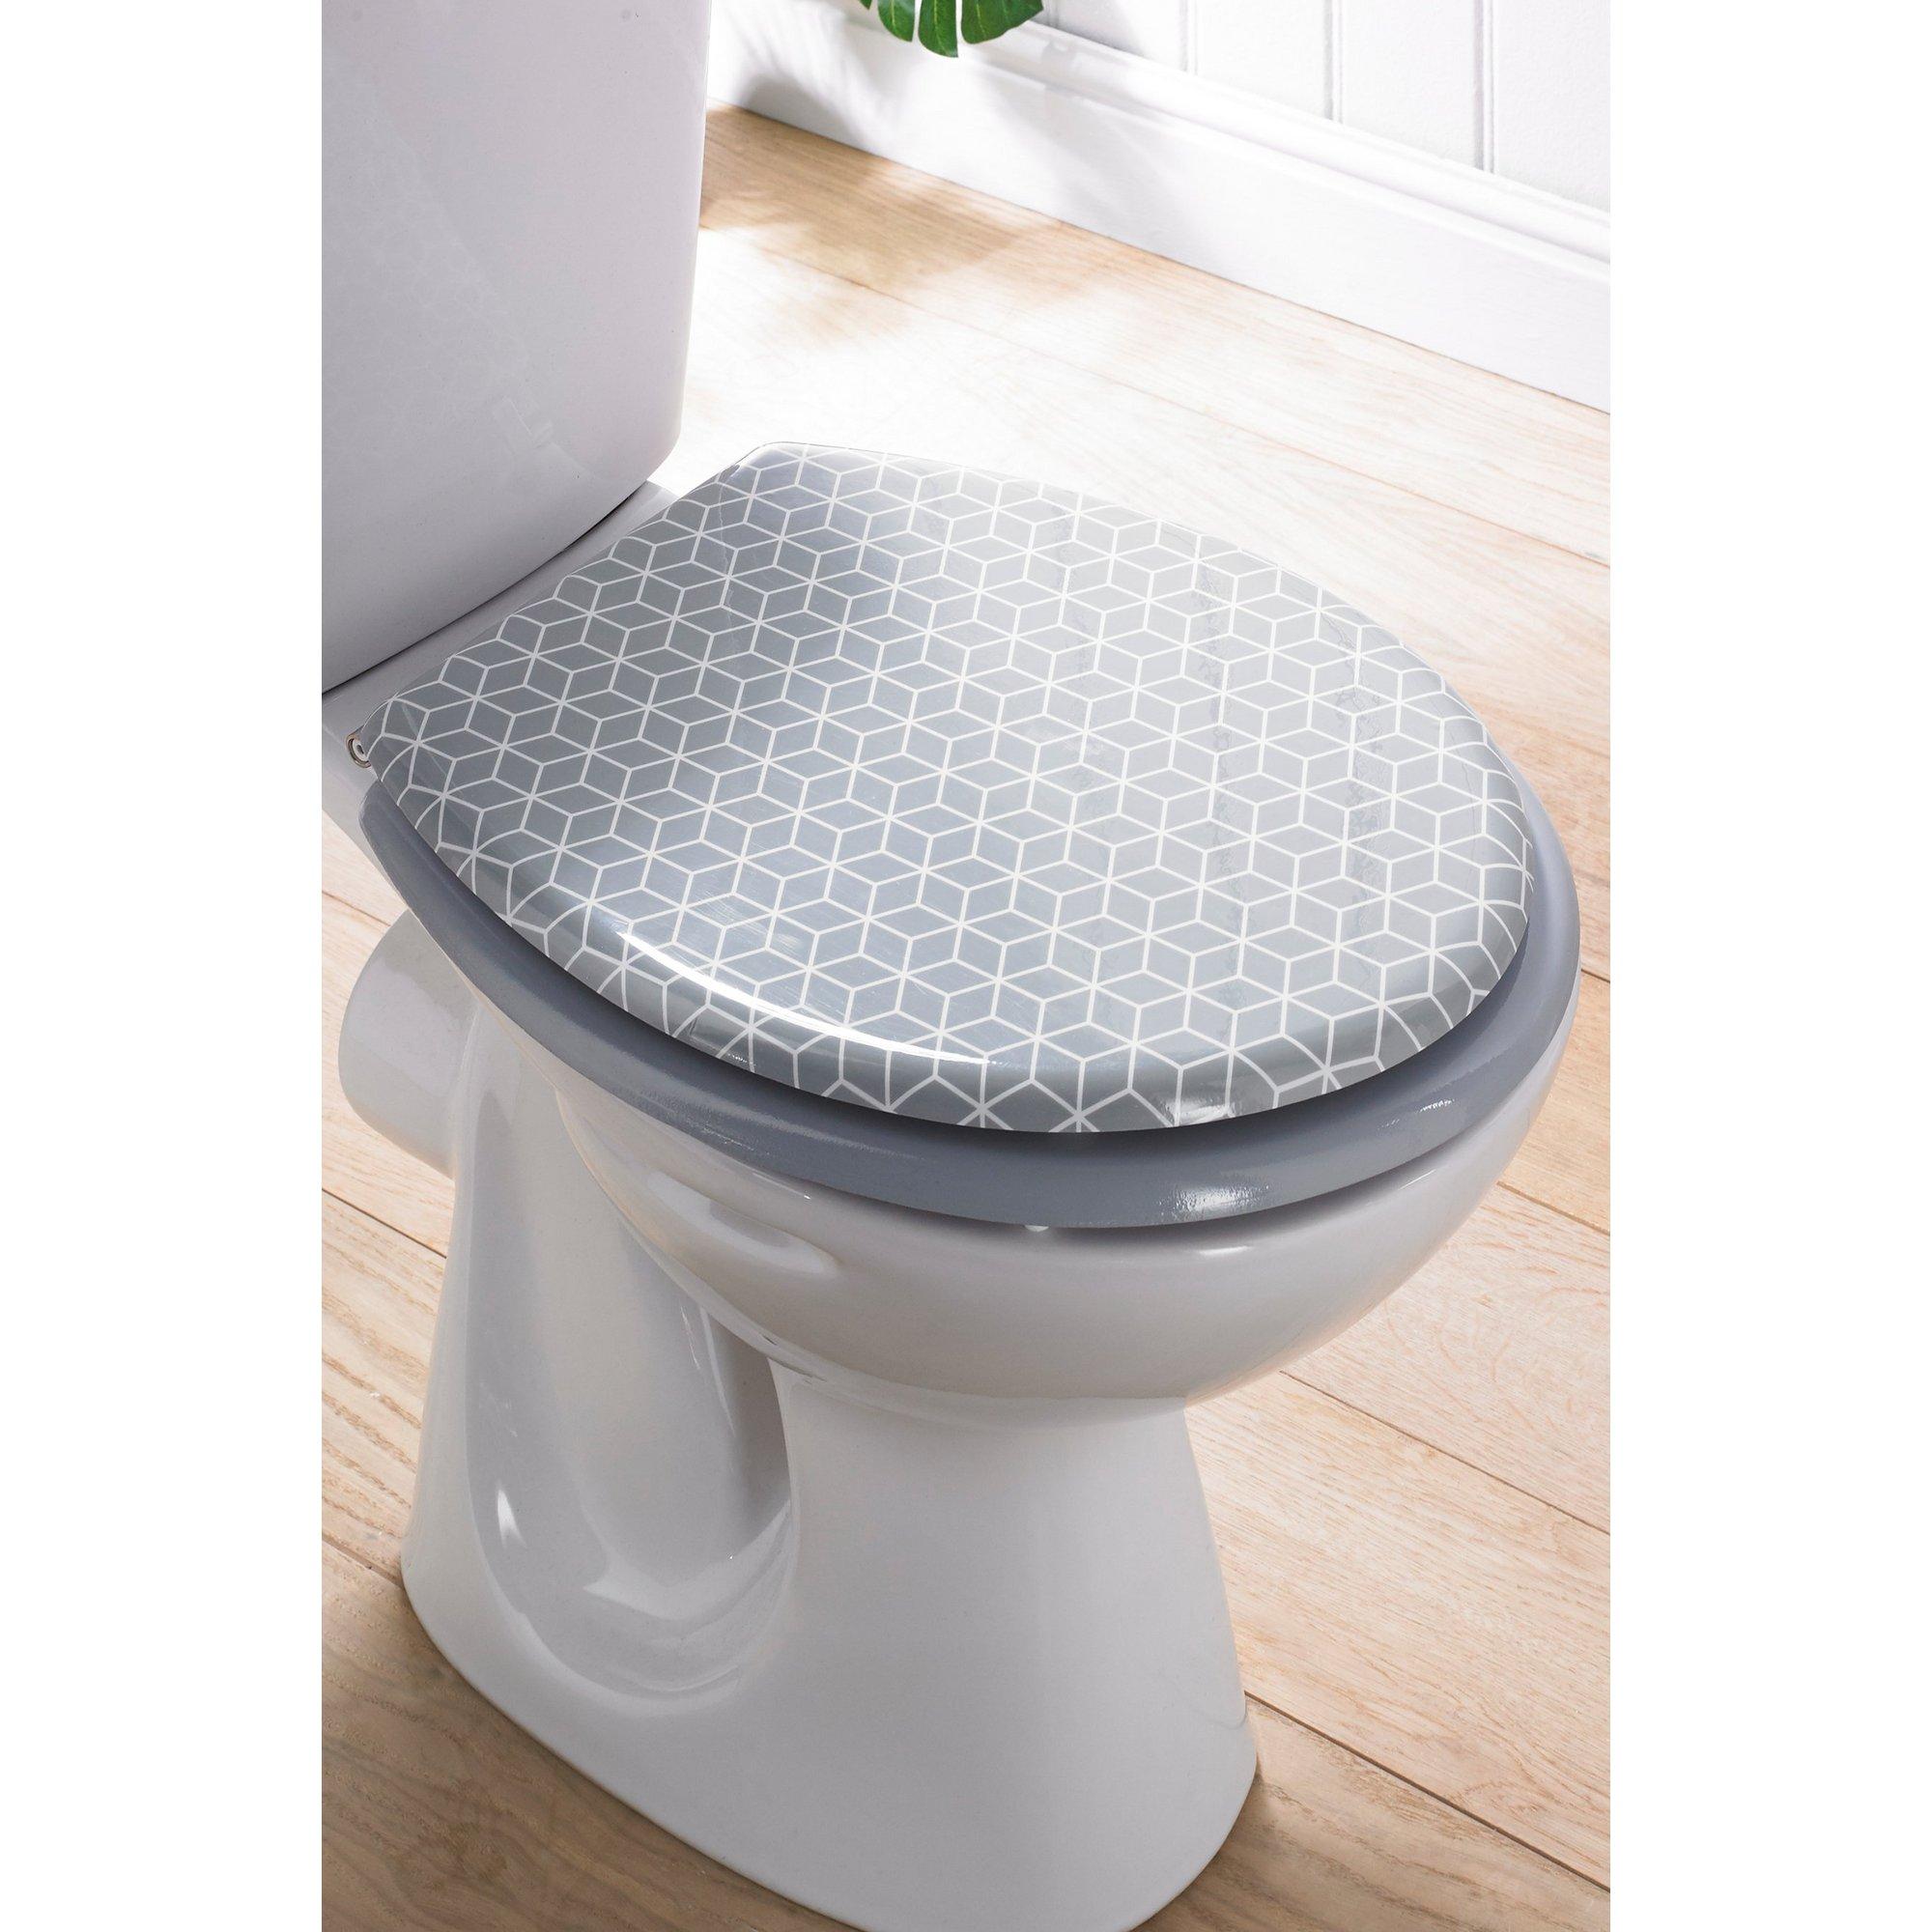 Image of Geometric Design Toilet Seat